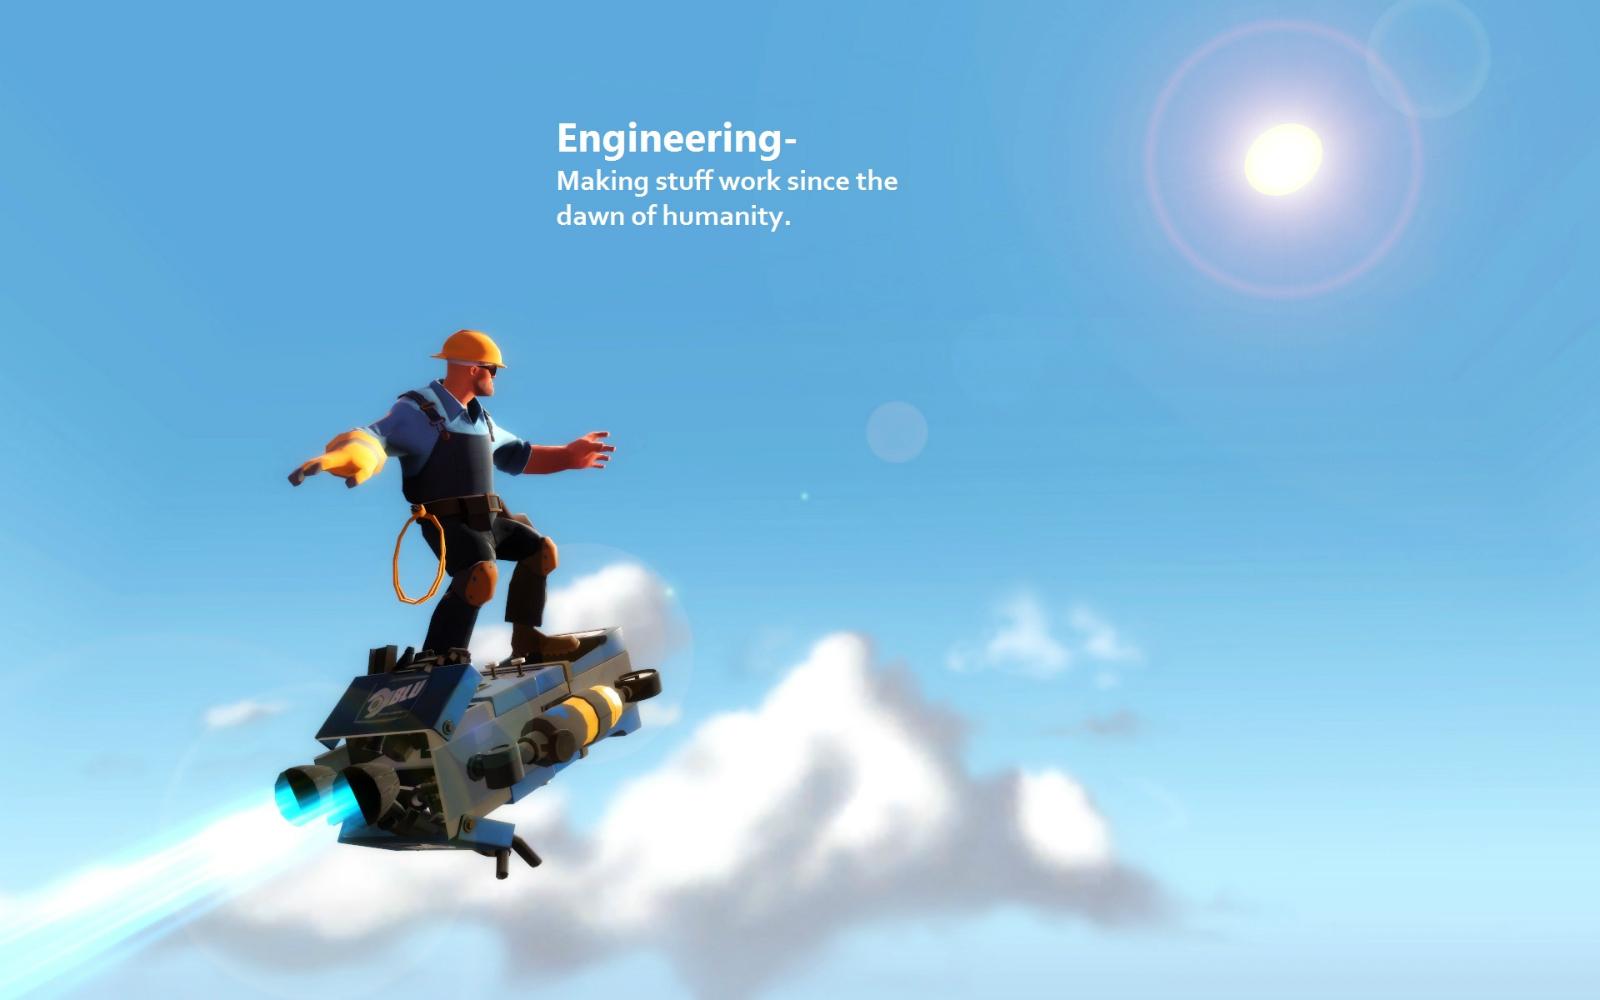 http://1.bp.blogspot.com/-T9B2ZOQiSwE/TmVDwdK2SnI/AAAAAAAAAzE/QTCAv7Mq3_c/s1600/team_fortress_2_engineer_blue_anime_text_www.Vvallpaper.net.jpg